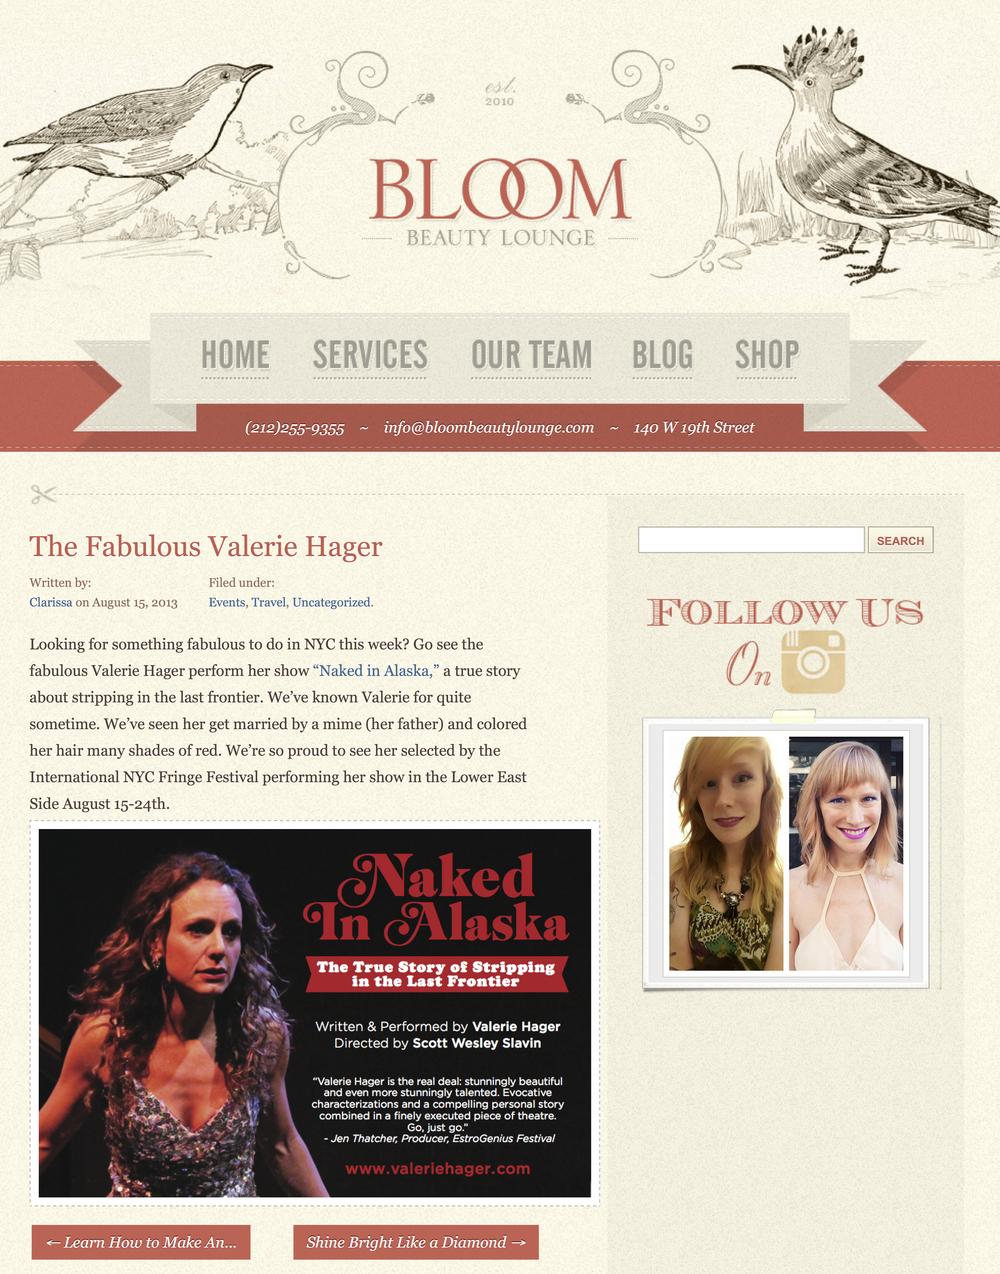 The Fabulous Valerie Hager | Bloom Beauty Lounge.jpg